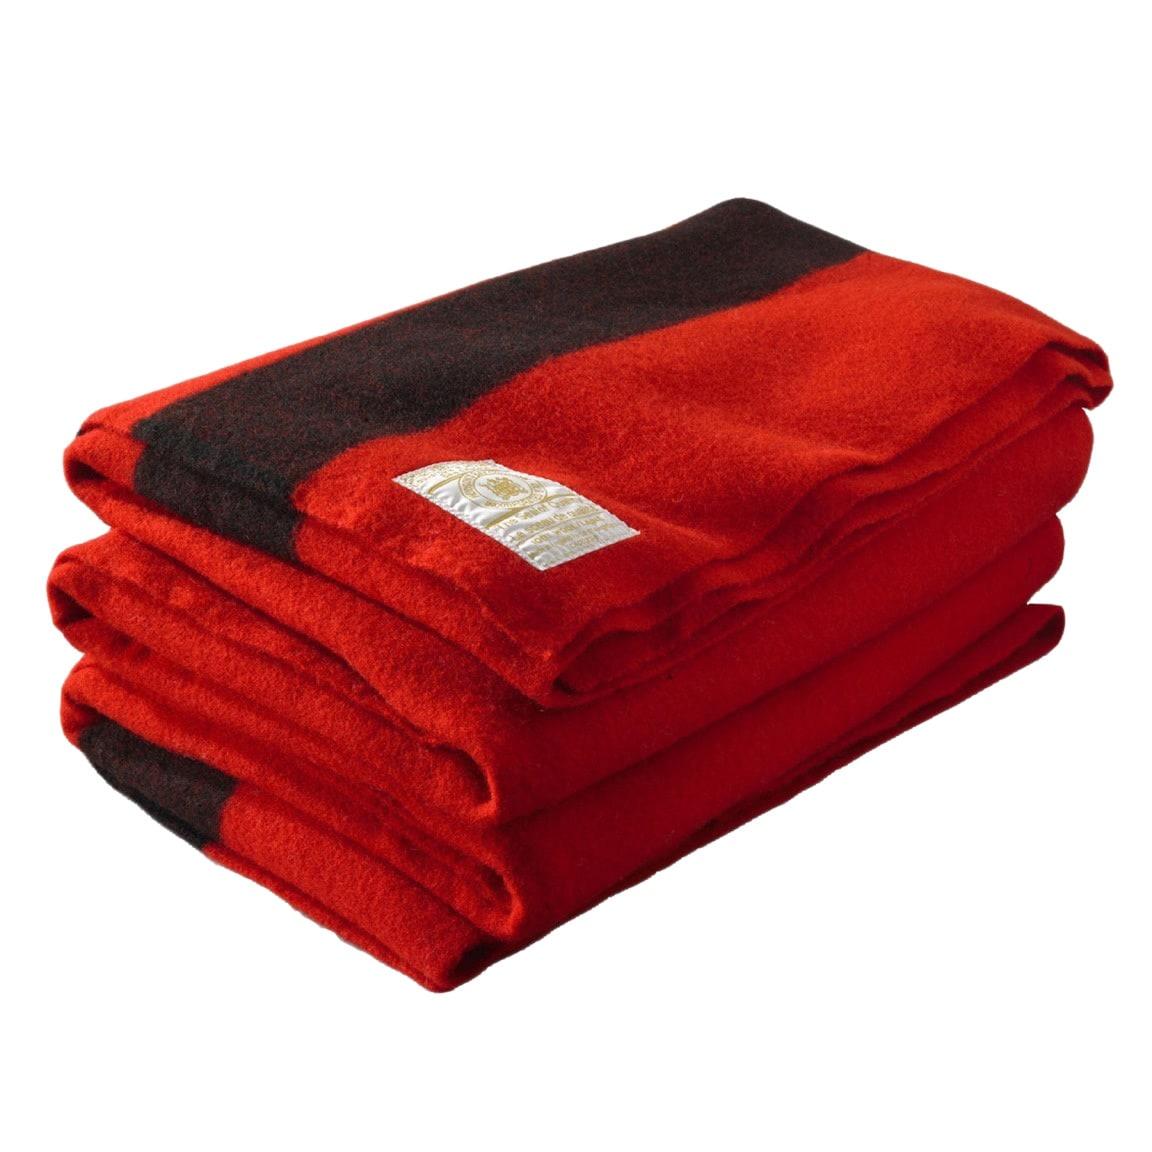 Woolrich Hudson's Bay 8-Point Scarlet Blanket (995081scar...